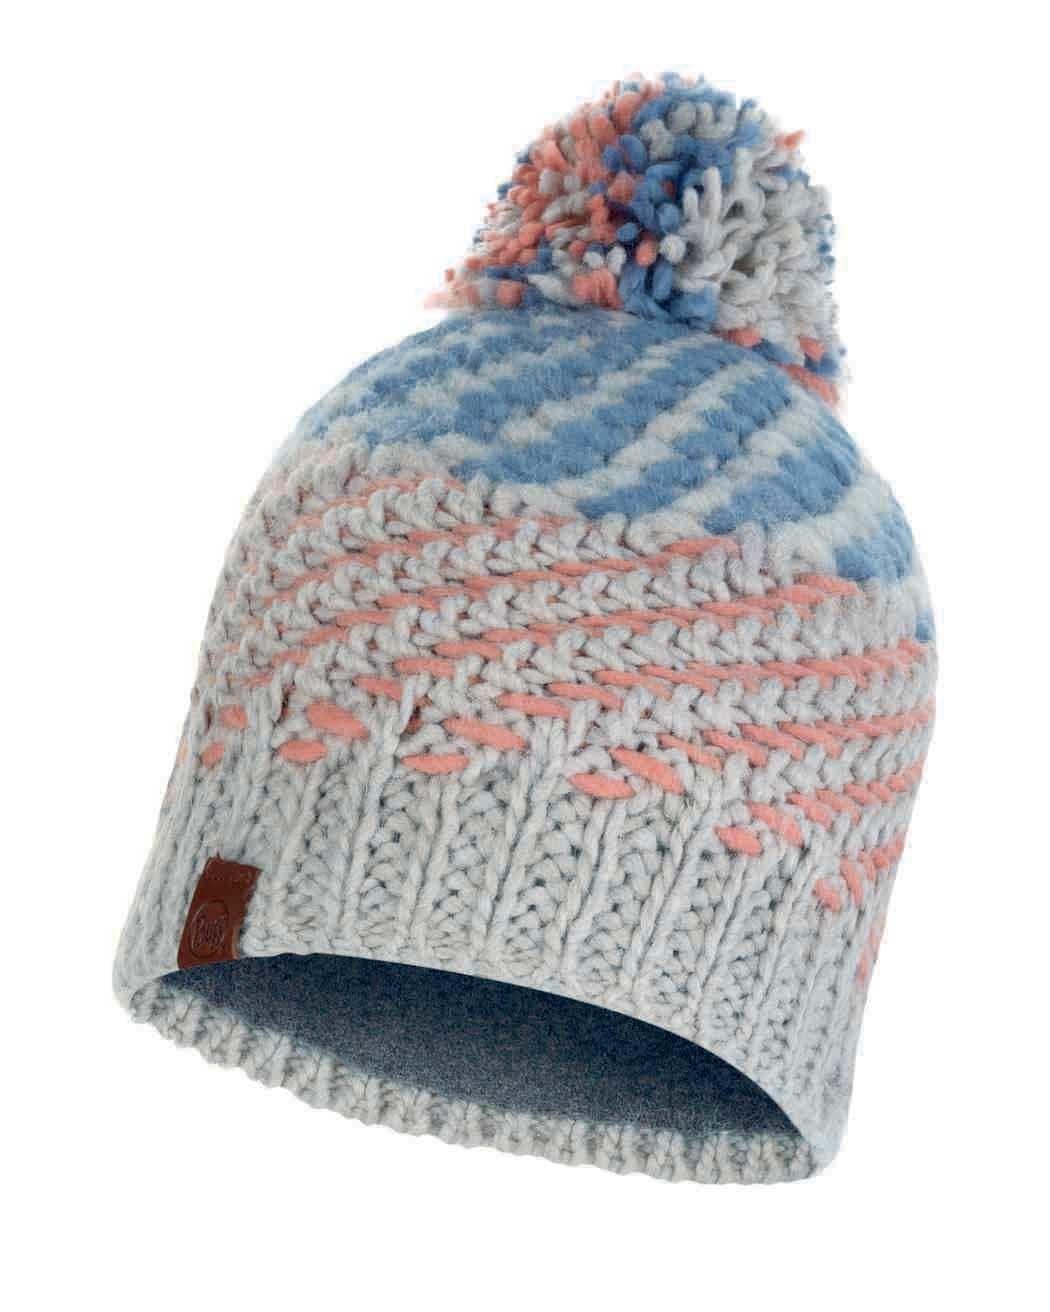 Шапки с помпоном Вязаная шапка с флисовой подкладкой Buff Hat Knitted Polar Nella Multi 117891.555.10.00.jpg